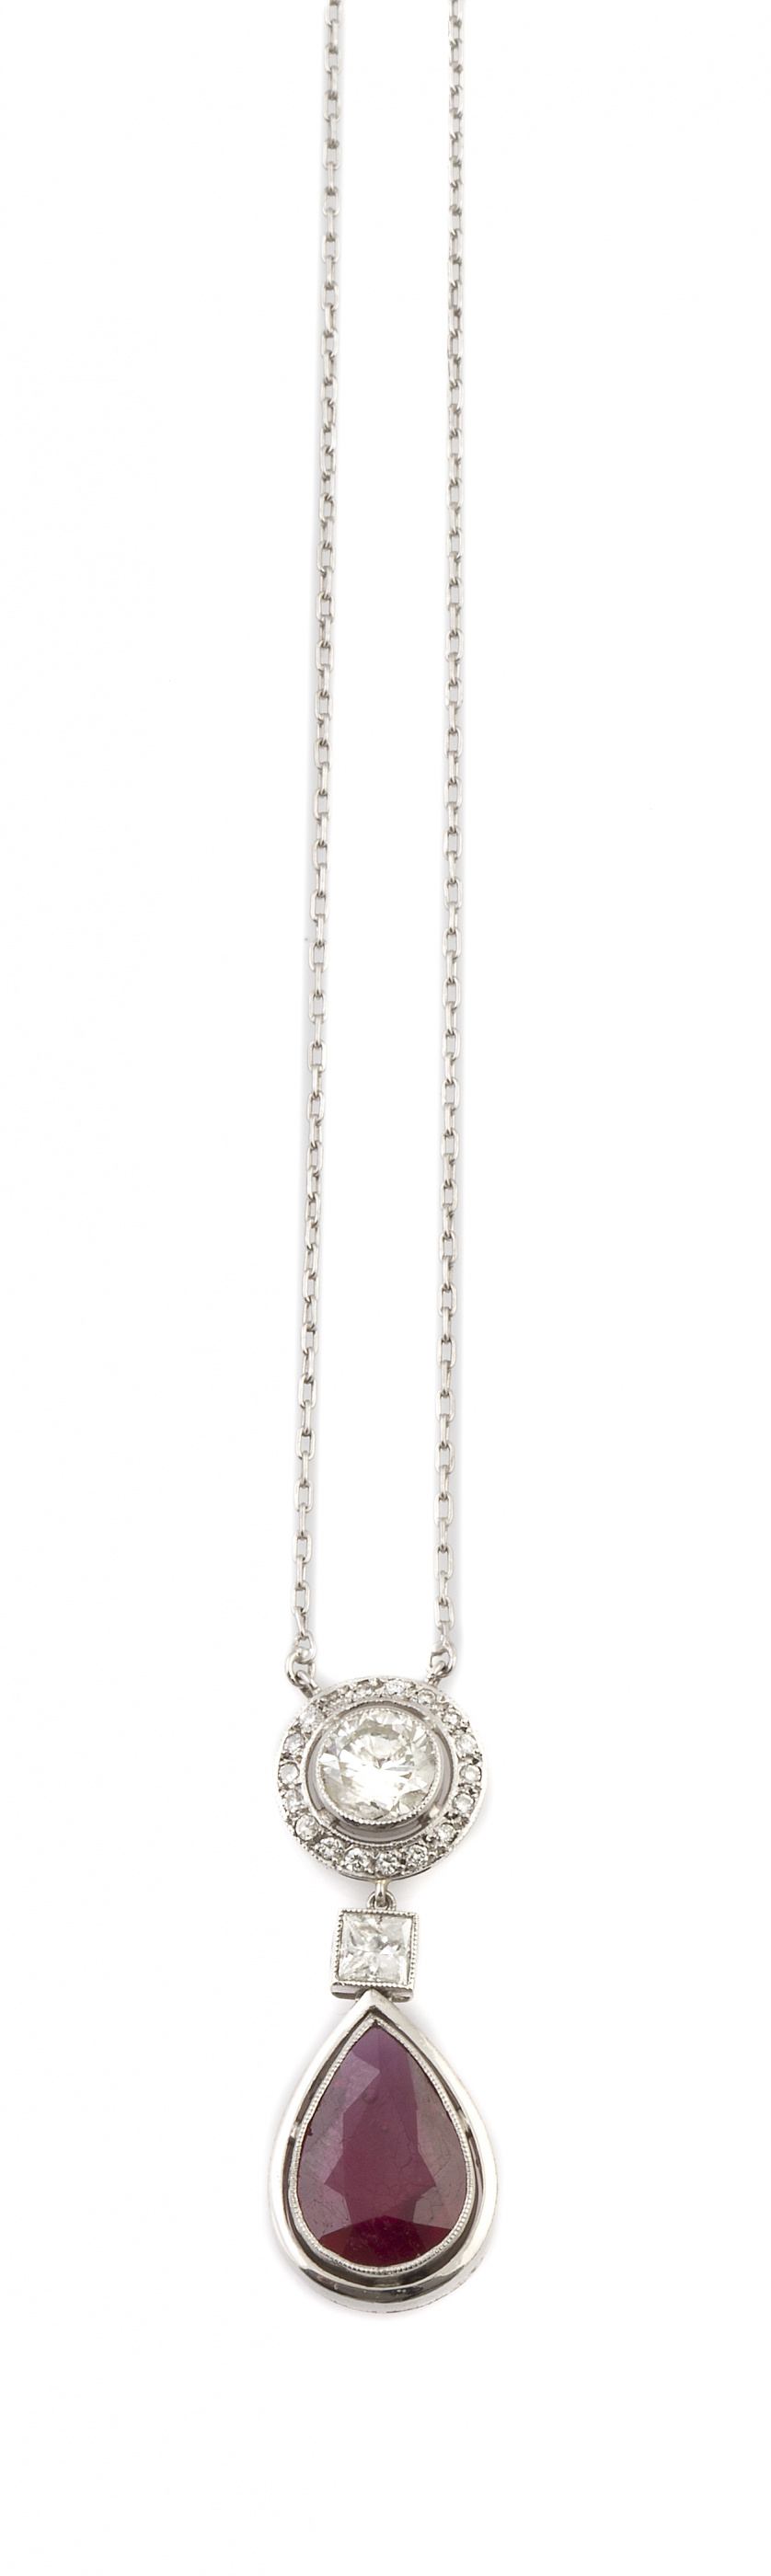 Pendentif estilo Art-Decó con rubí talla perilla de 4 ct ,q